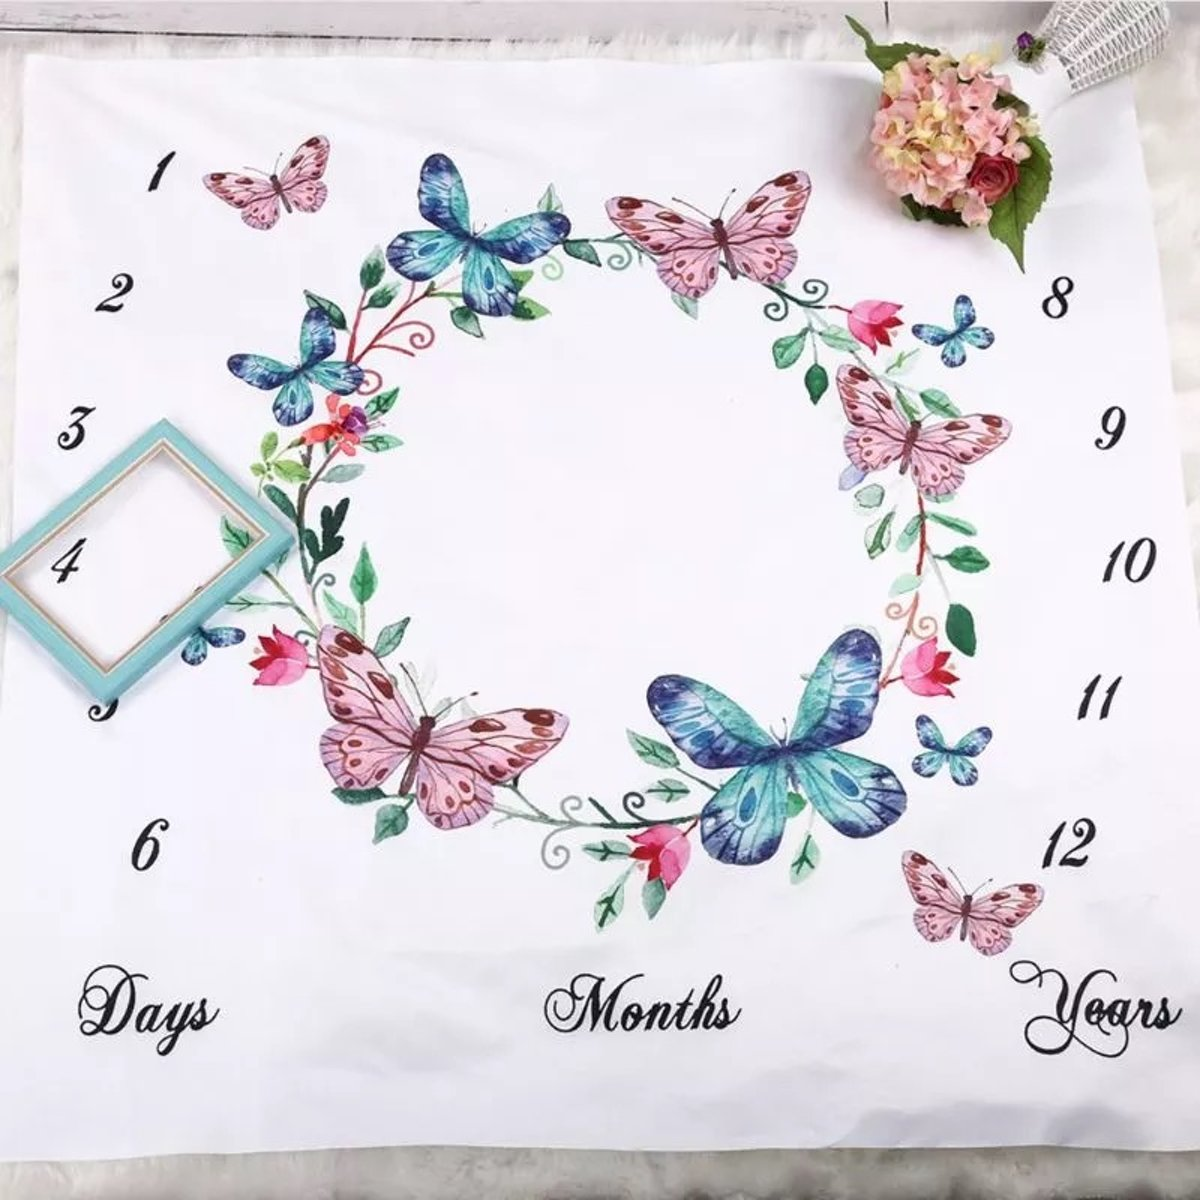 Milestone deken vlinders  - Mijlpaaldeken - fotoherinnering - kraamcadeau - babyshower cadeau - foto mijlpaal deken